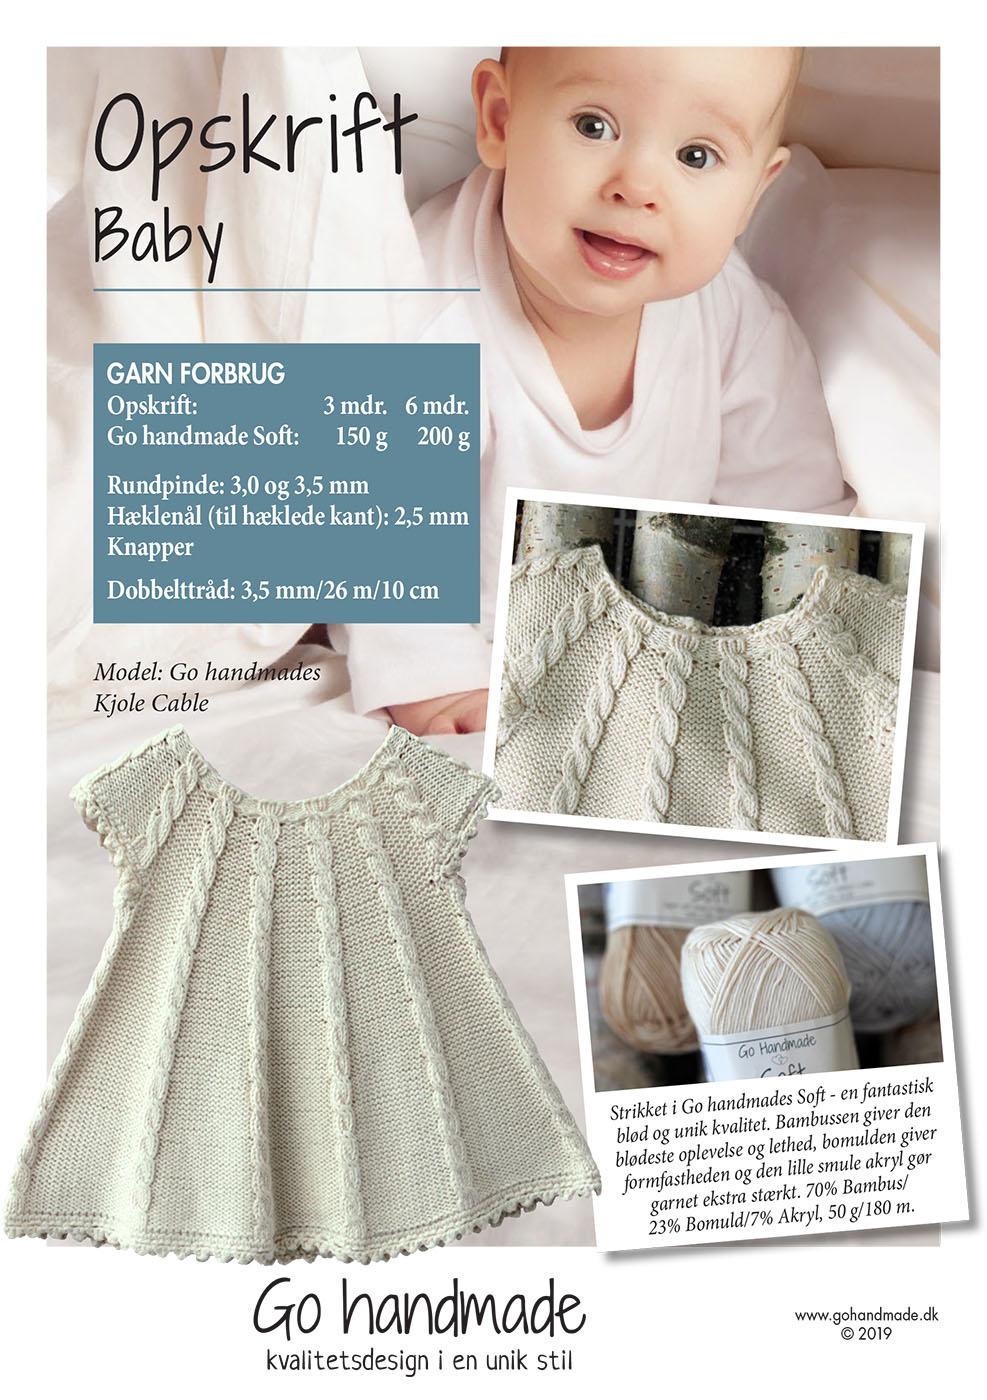 52fc55eb925 Kjole Cable - DK - Strikket babytøj - Go Handmade